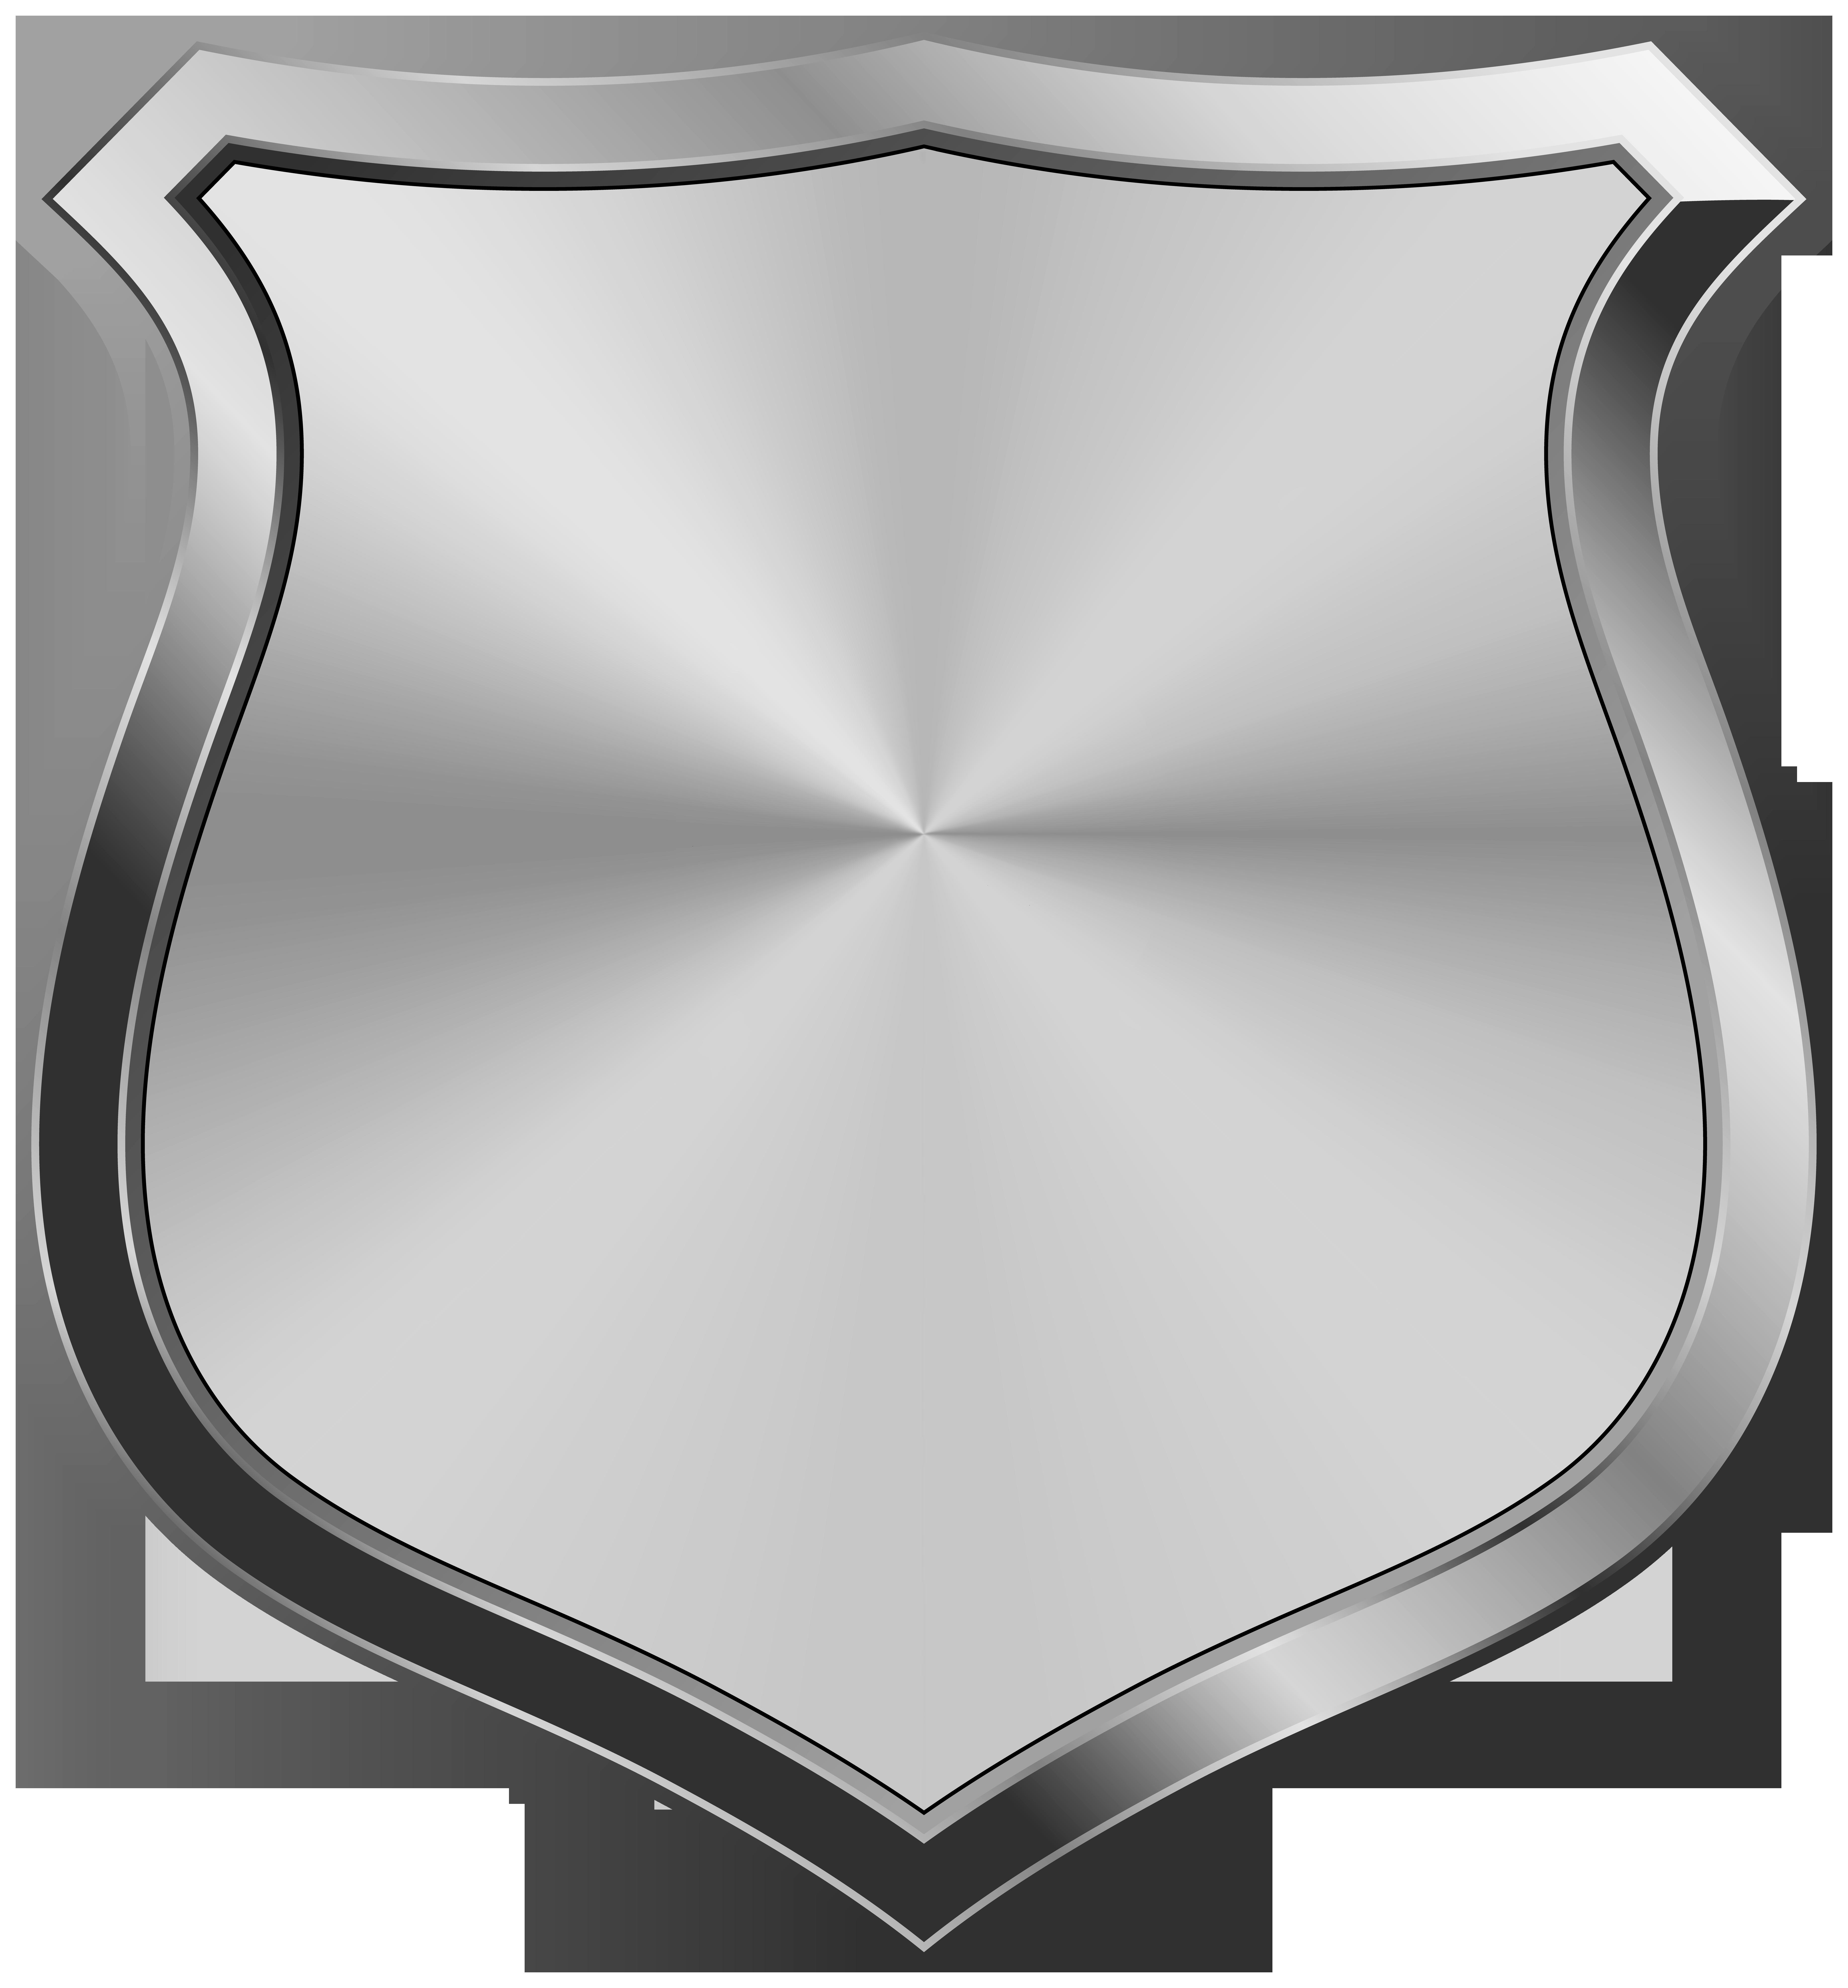 Silver Badge Clip Art Transparent Image.